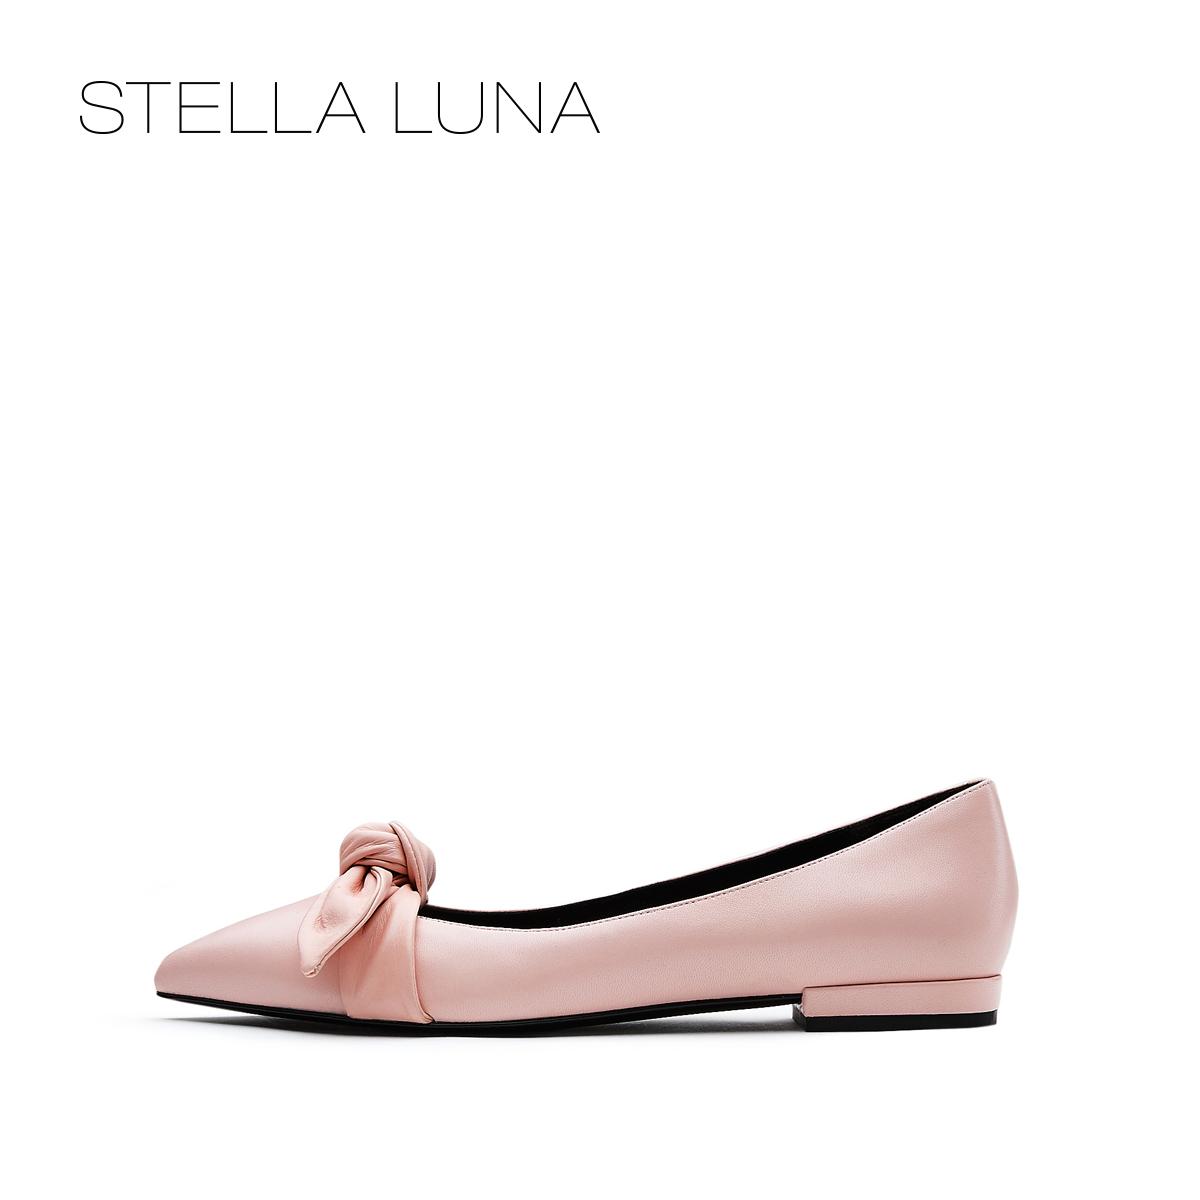 STELLA LUNA2018春夏新款蝴蝶结尖头浅口平底鞋女单鞋